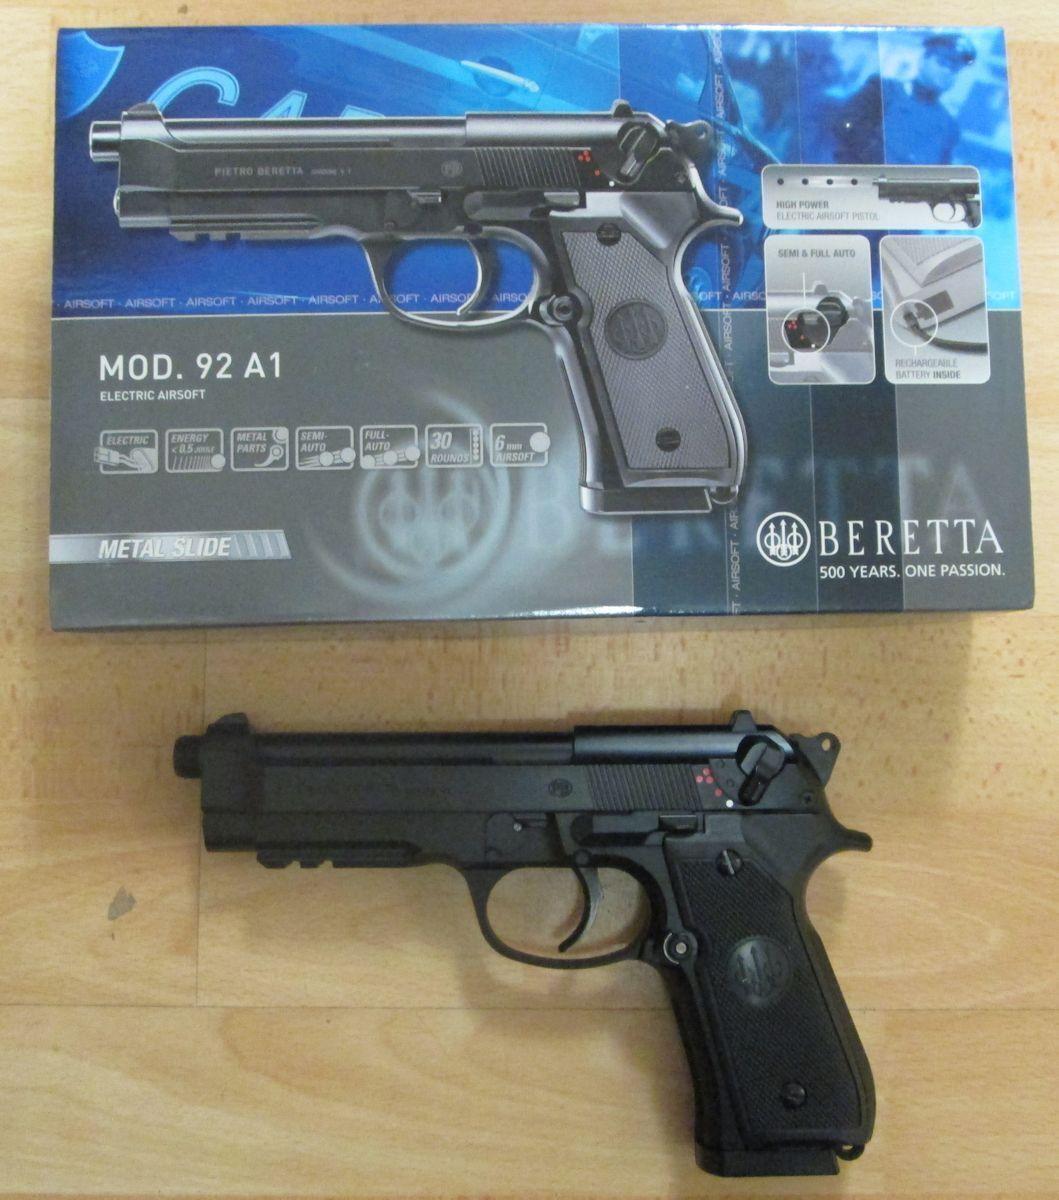 Umarex Softairpistole Softair 25872 Waffe Pistole Airsoft Airsoftwaffe Beretta 25872 Softair f1d4fd